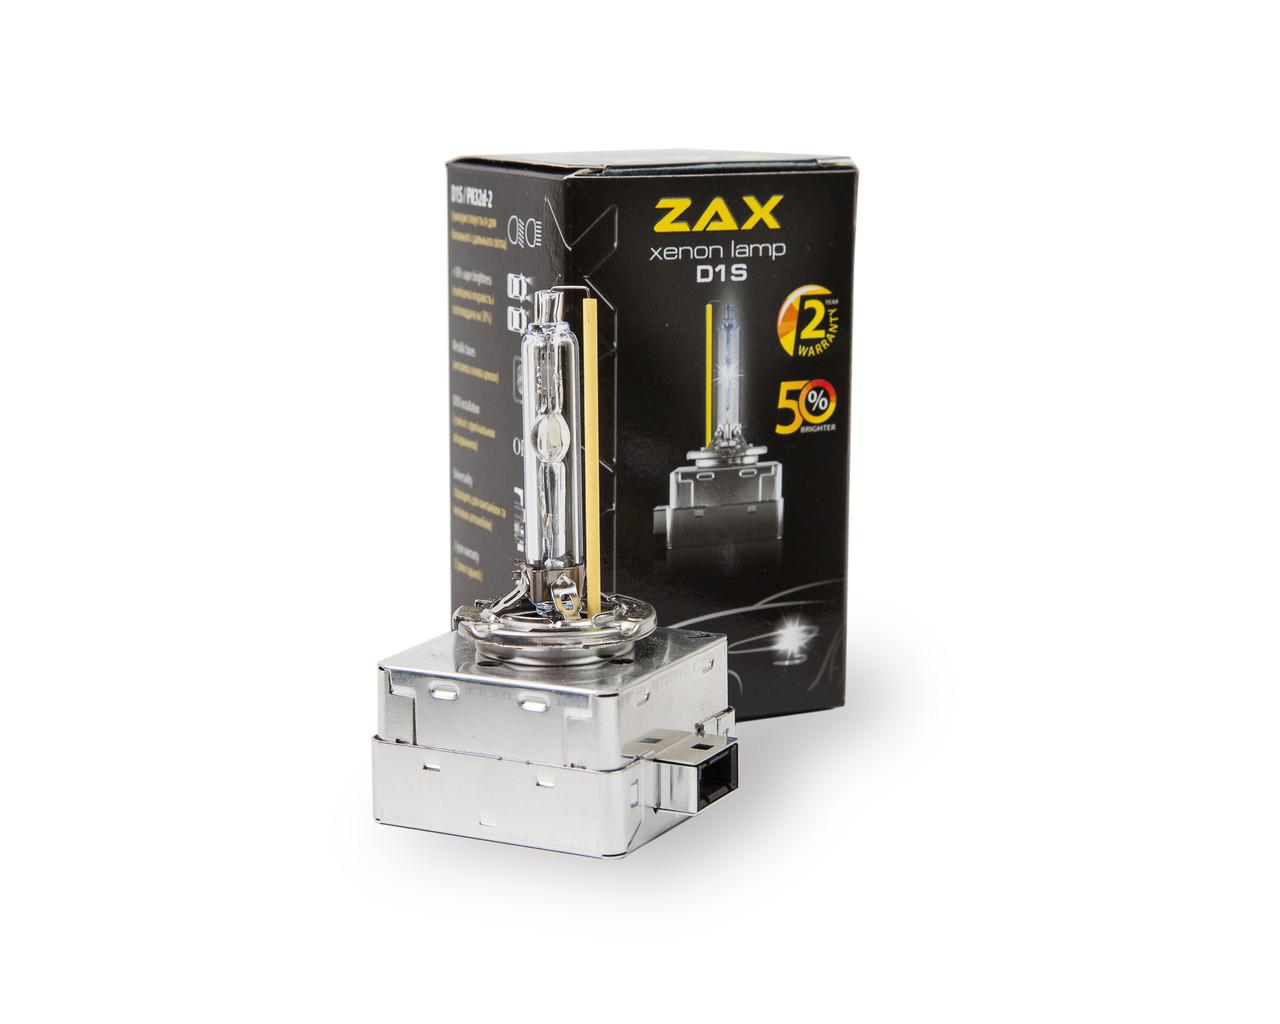 Ксеноновая лампа Zax metal base D1S +50% 5000K (hub_ixbk27209)